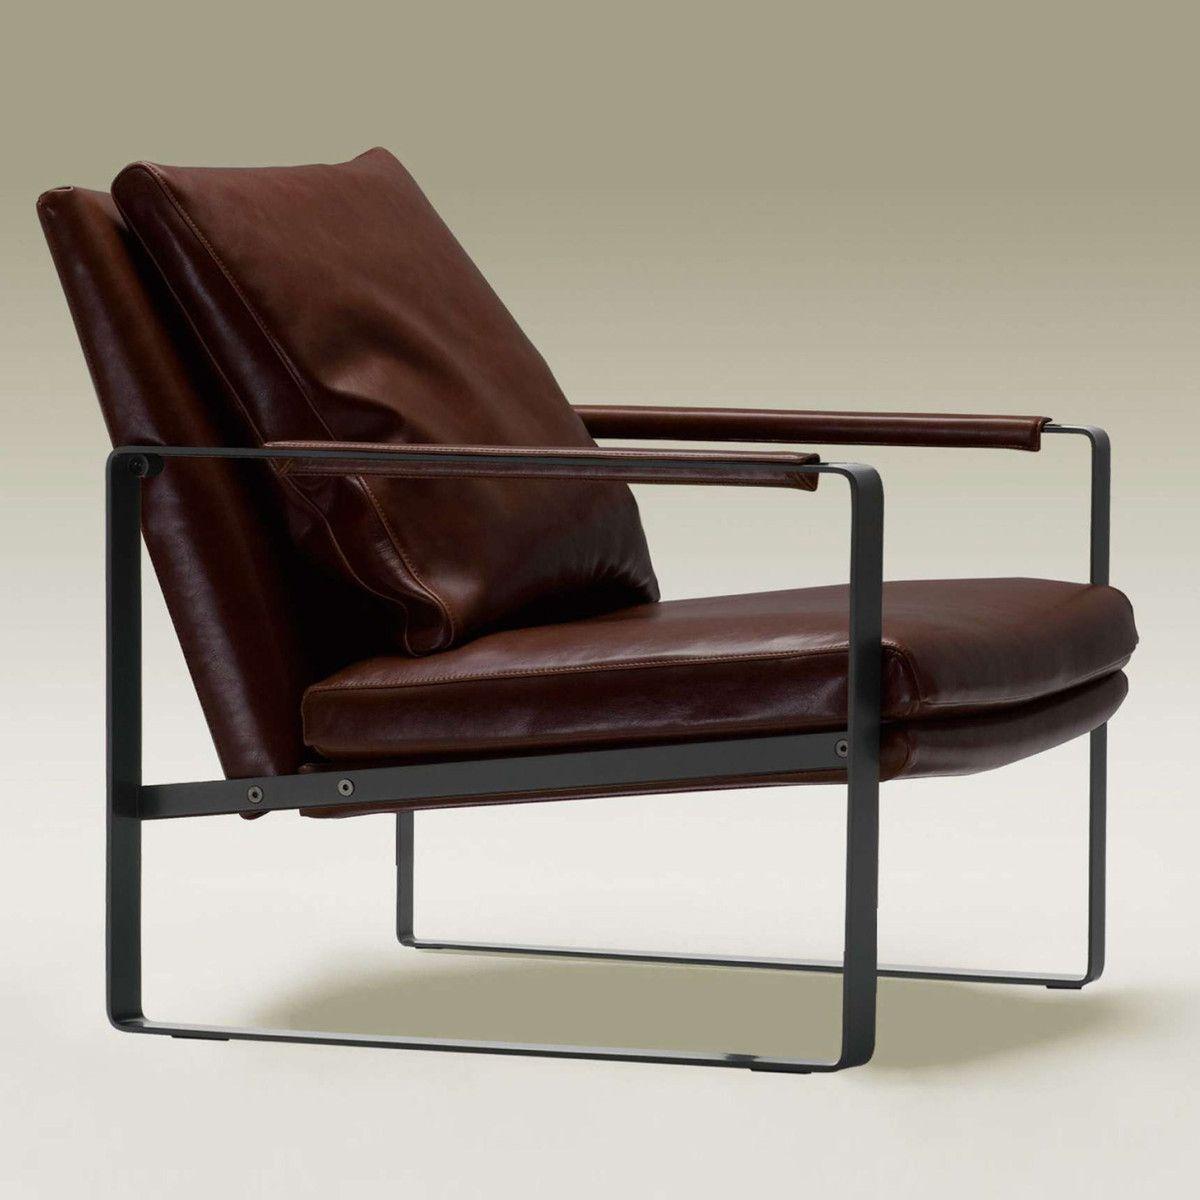 small sofas and armchairs build a sofa austin reviews camerich leman armchair azulandcompany azulandco